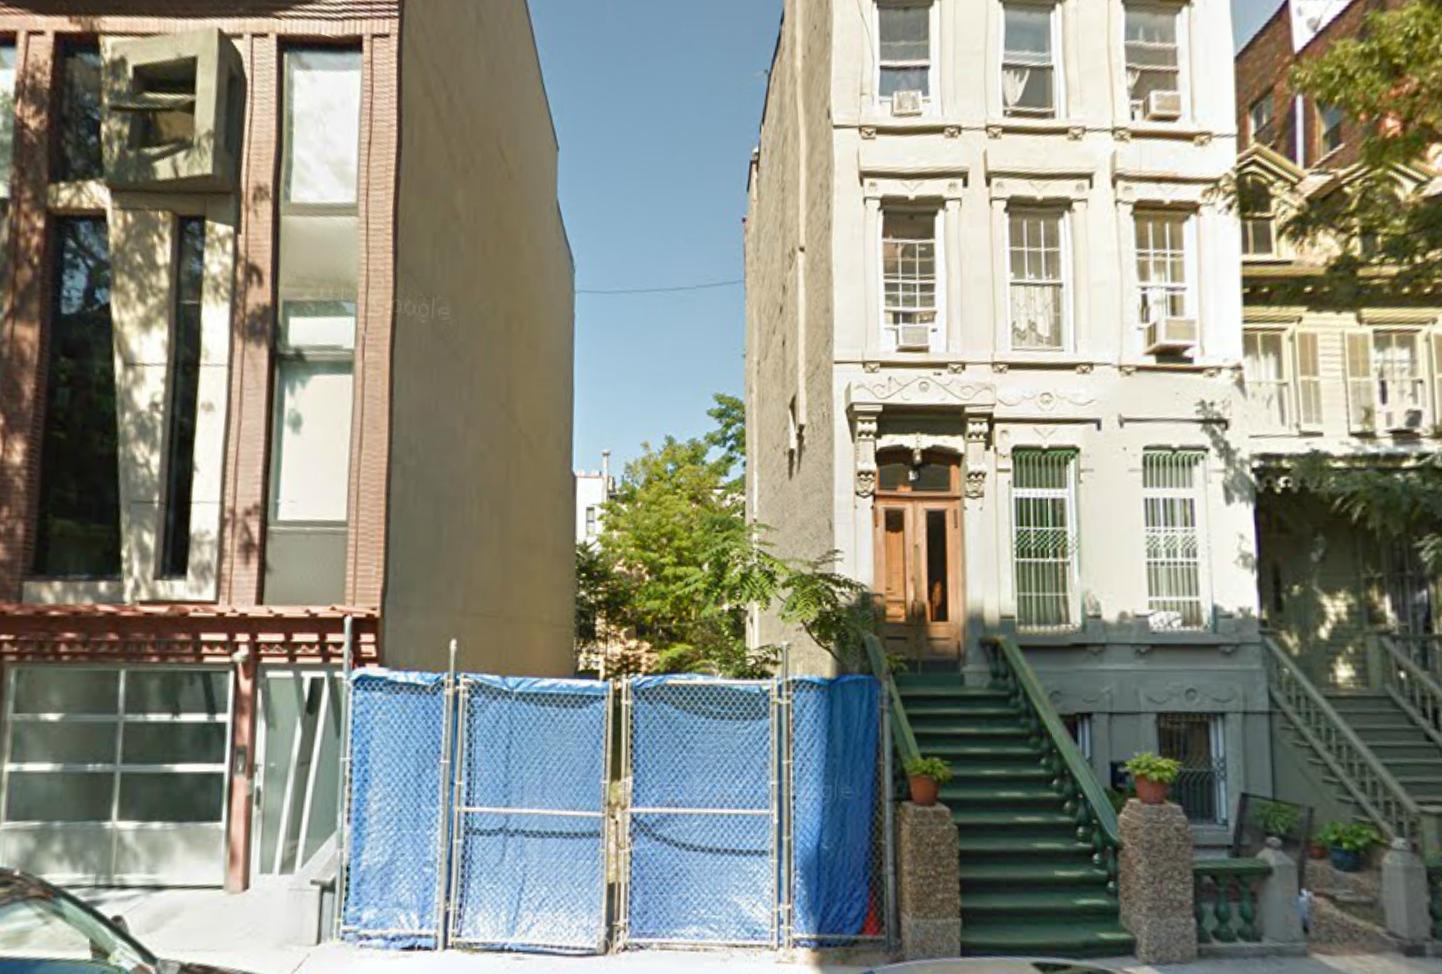 13 East 128th Street